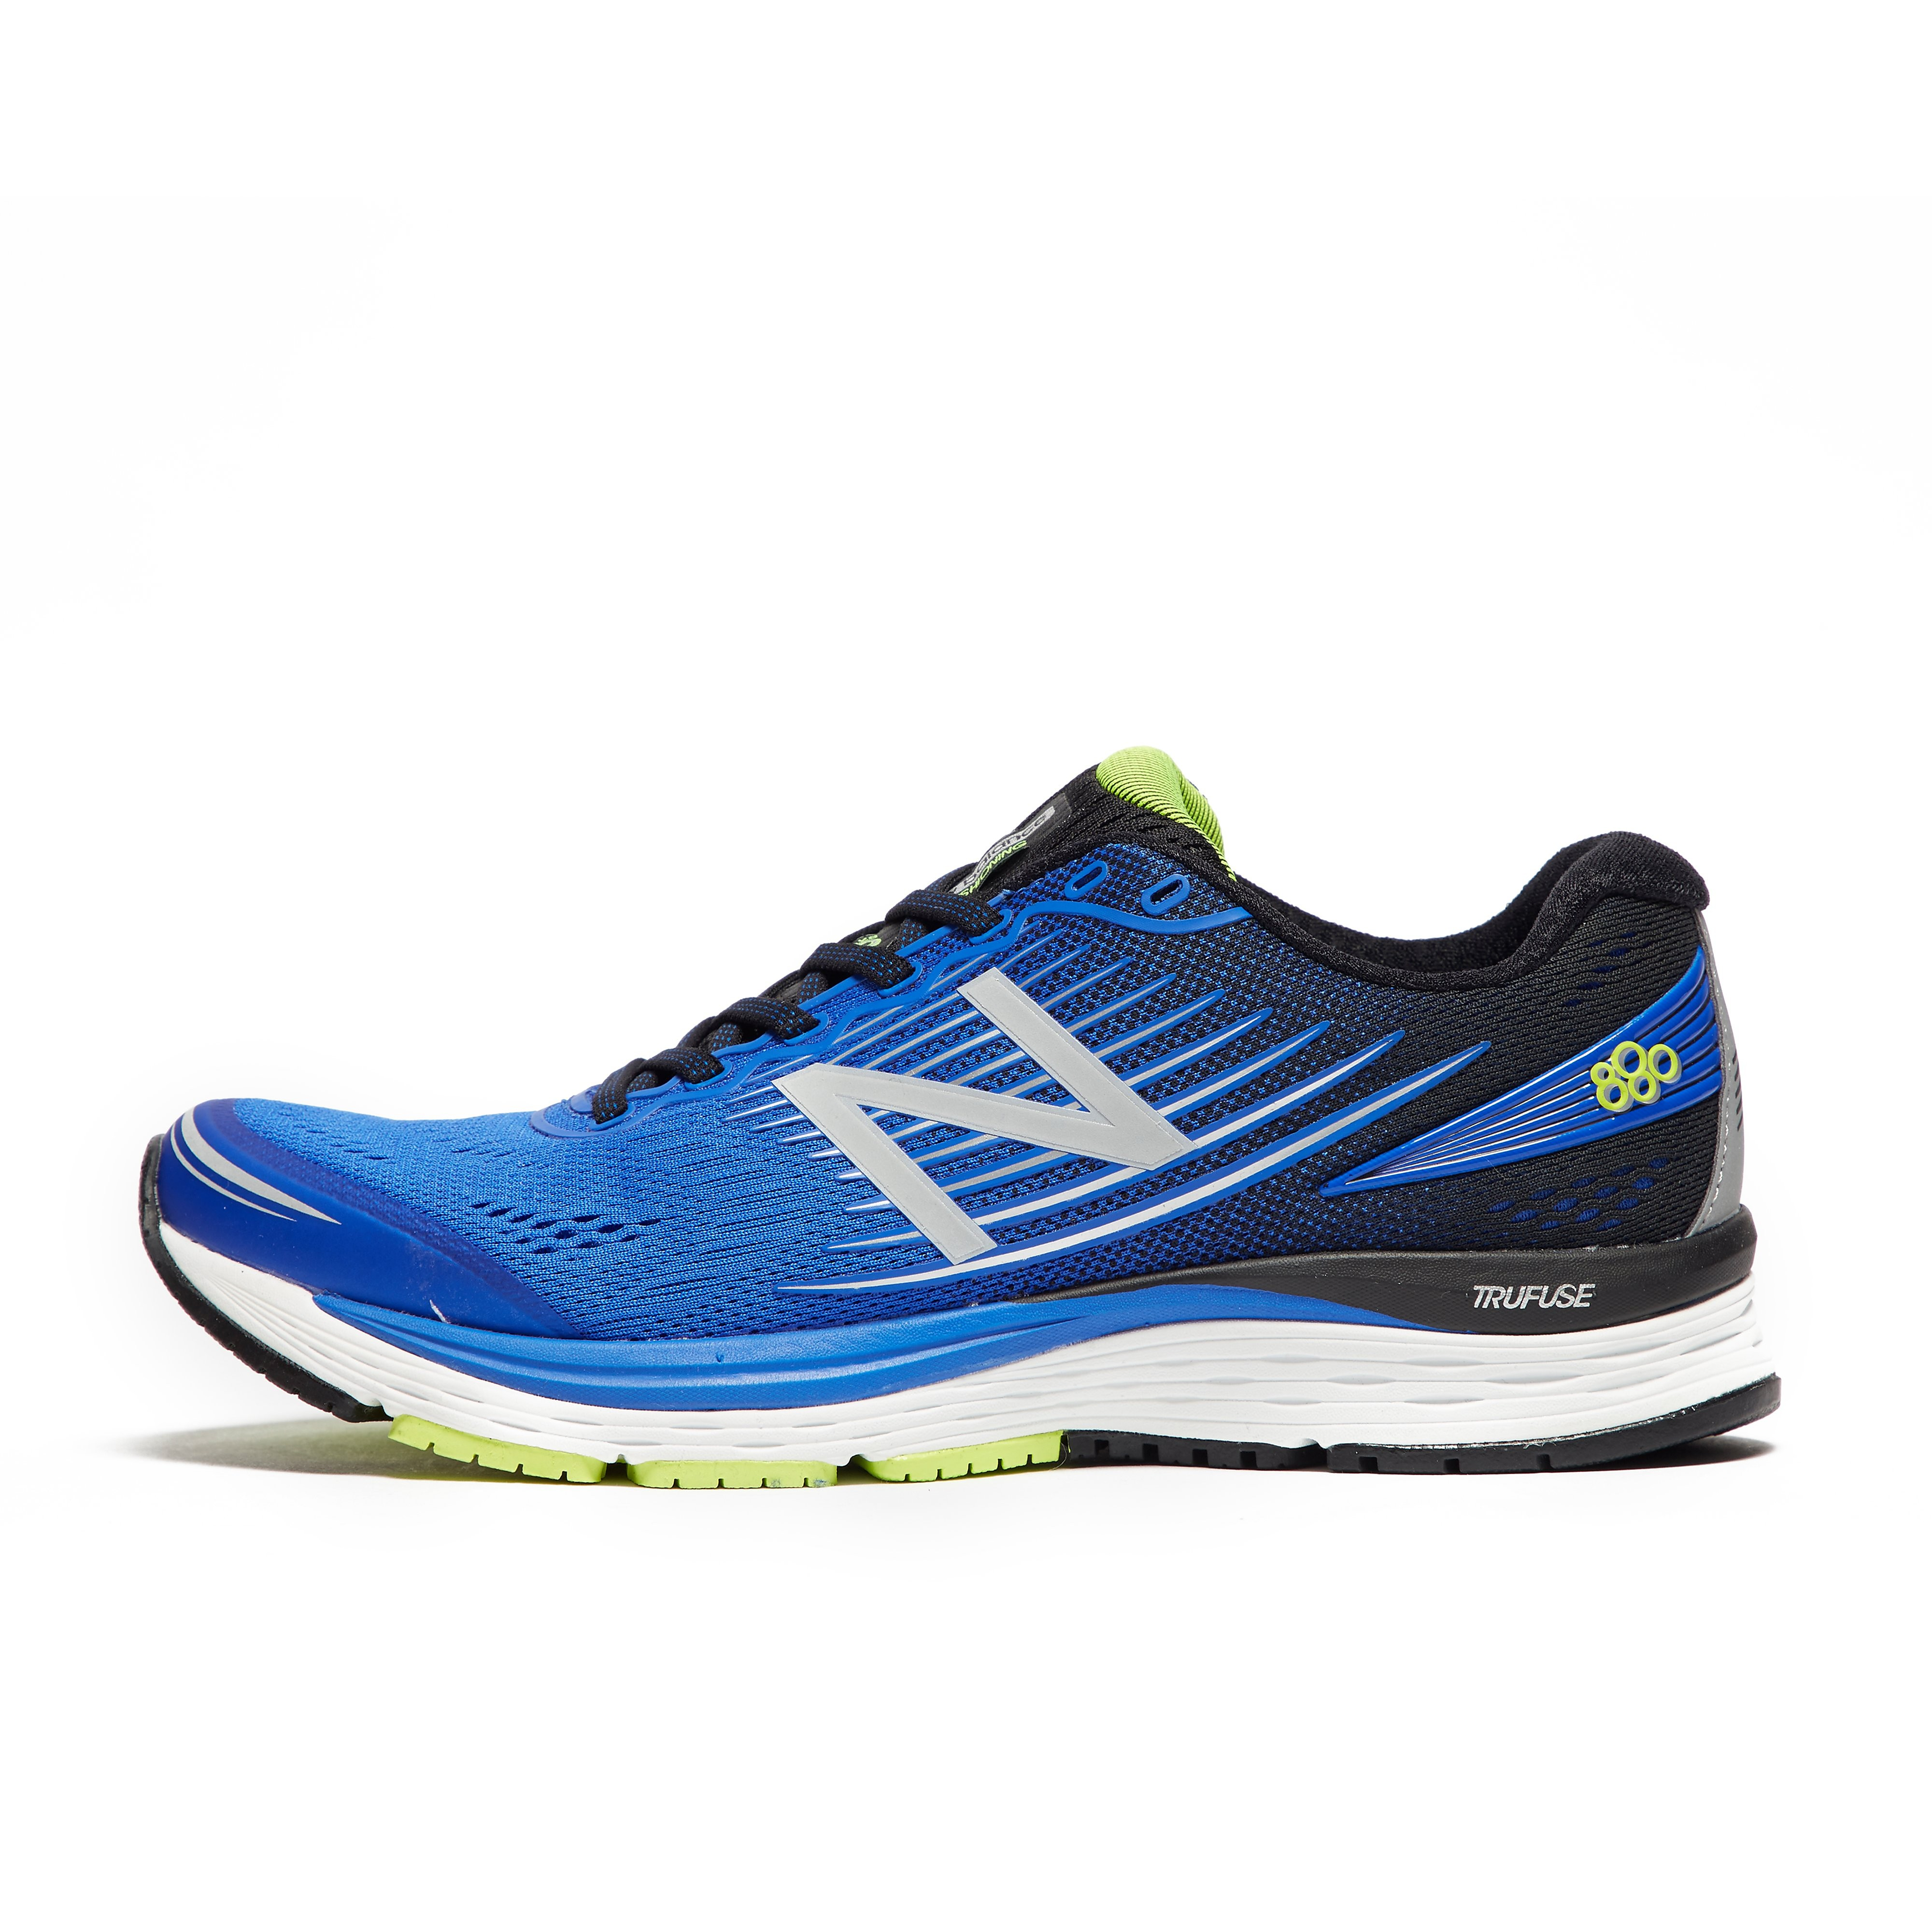 Mens Blue New Balance 880v8 Running Shoes